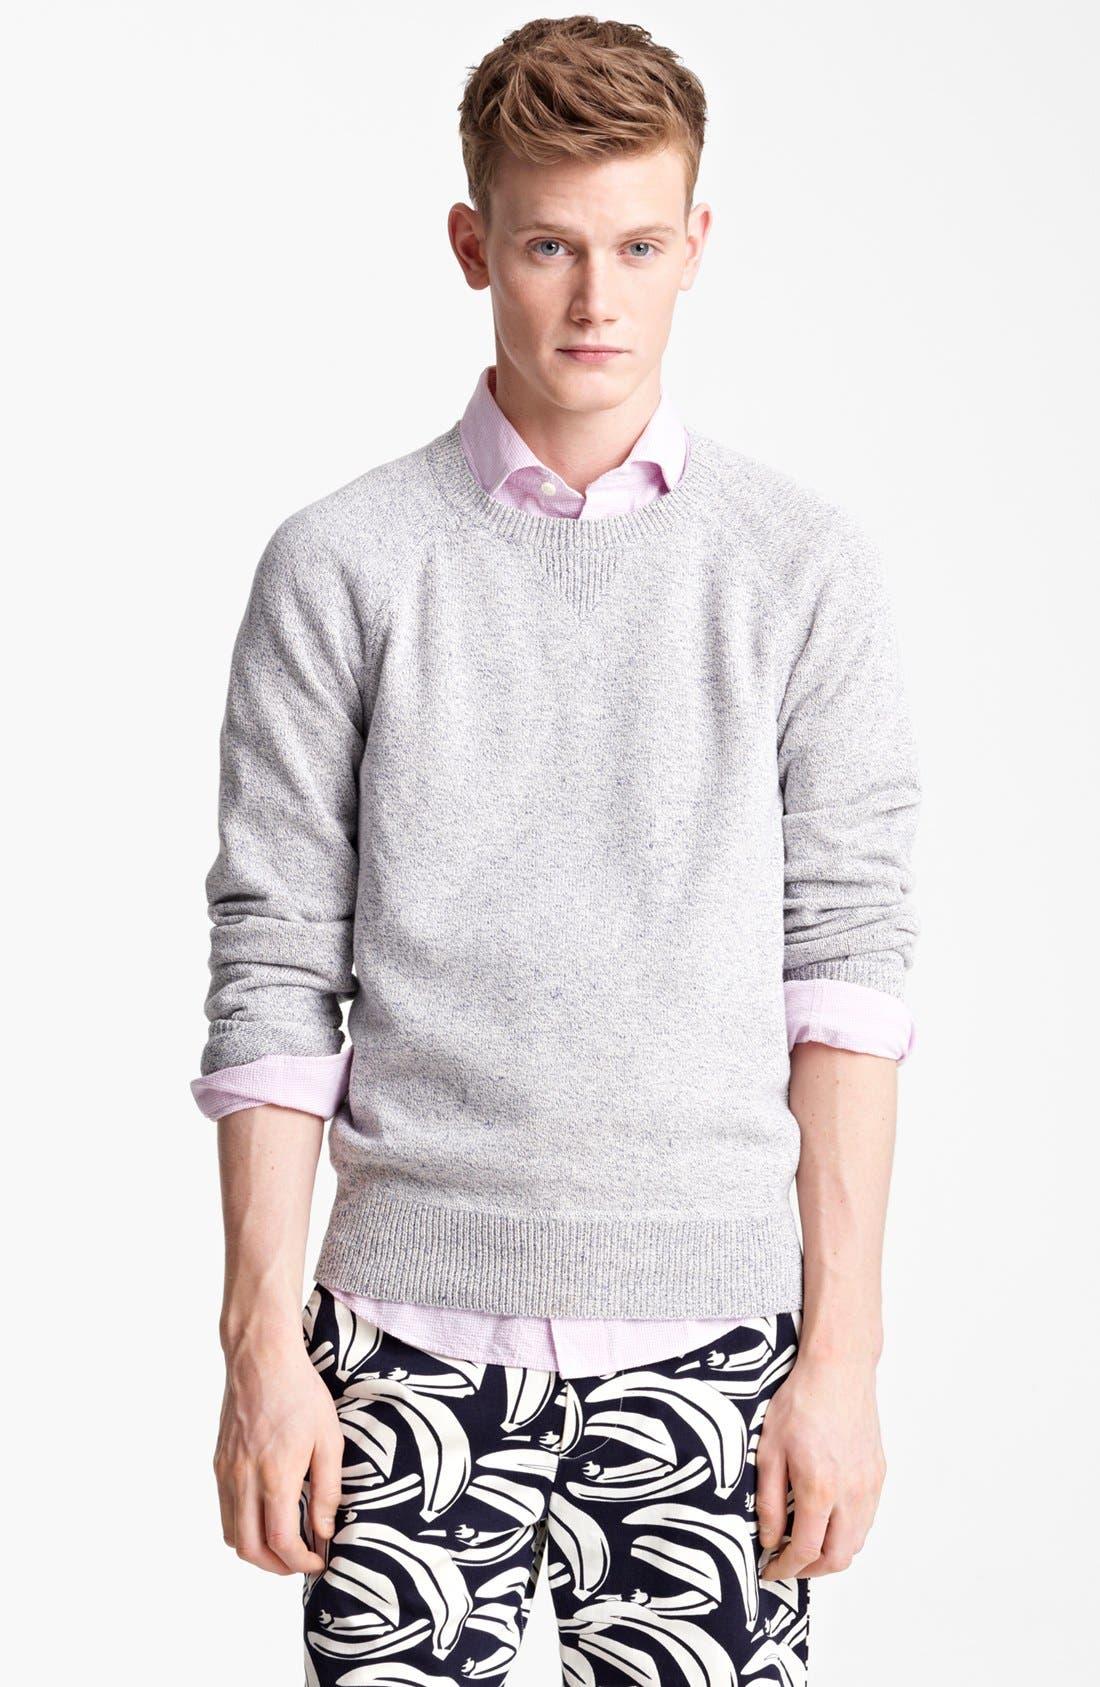 Alternate Image 1 Selected - Jack Spade 'Dawson' Cotton & Linen Crewneck Sweater